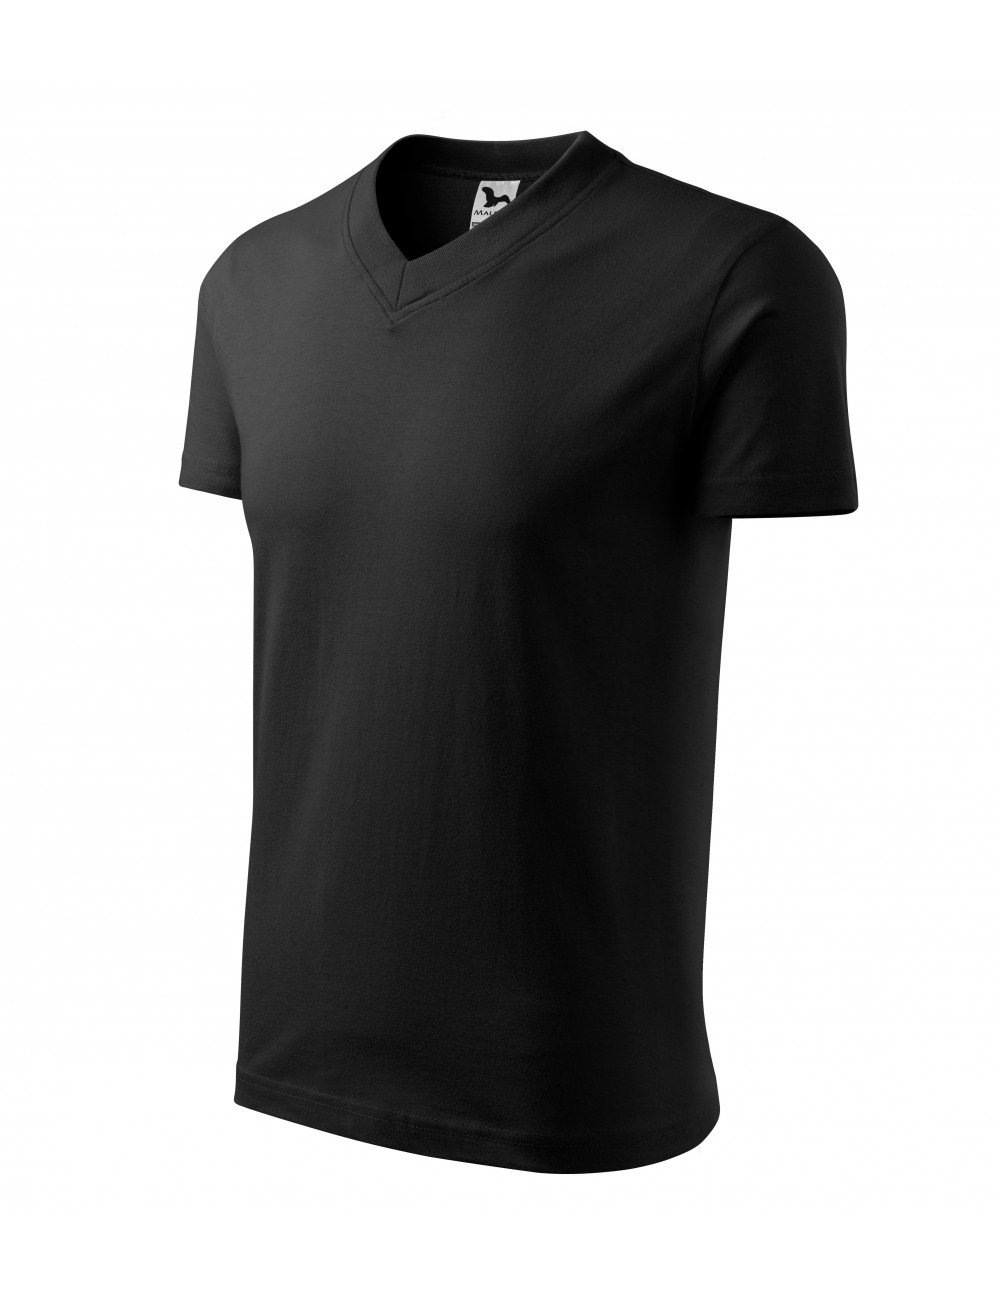 Adler MALFINI Koszulka unisex V-neck 102 czarny